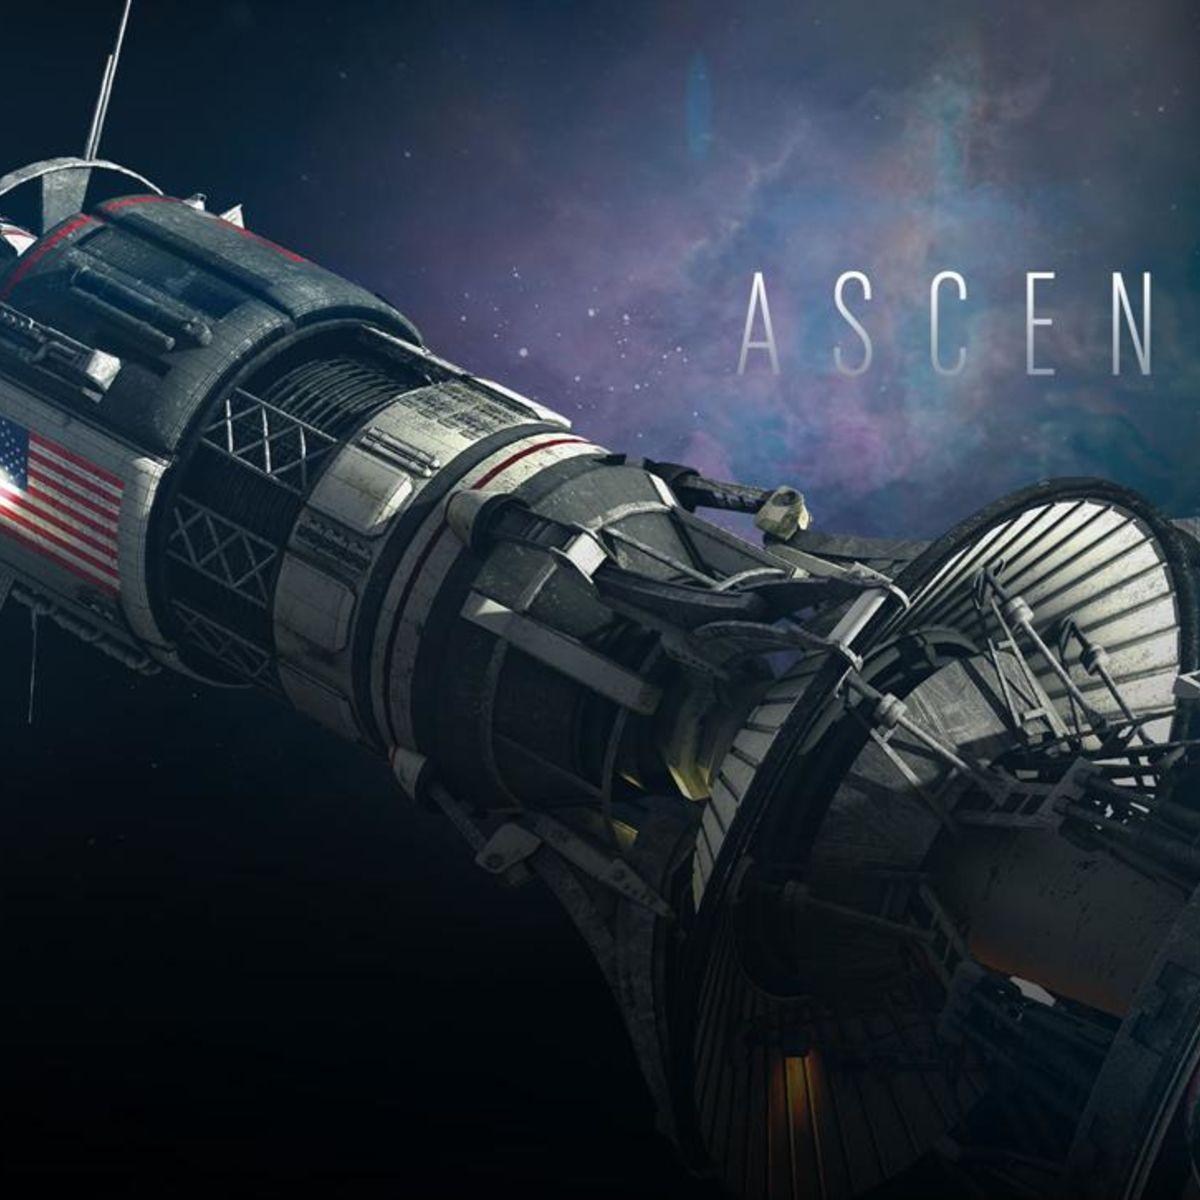 ascension_detail_2560x1450_1280x725_317194819537.jpg